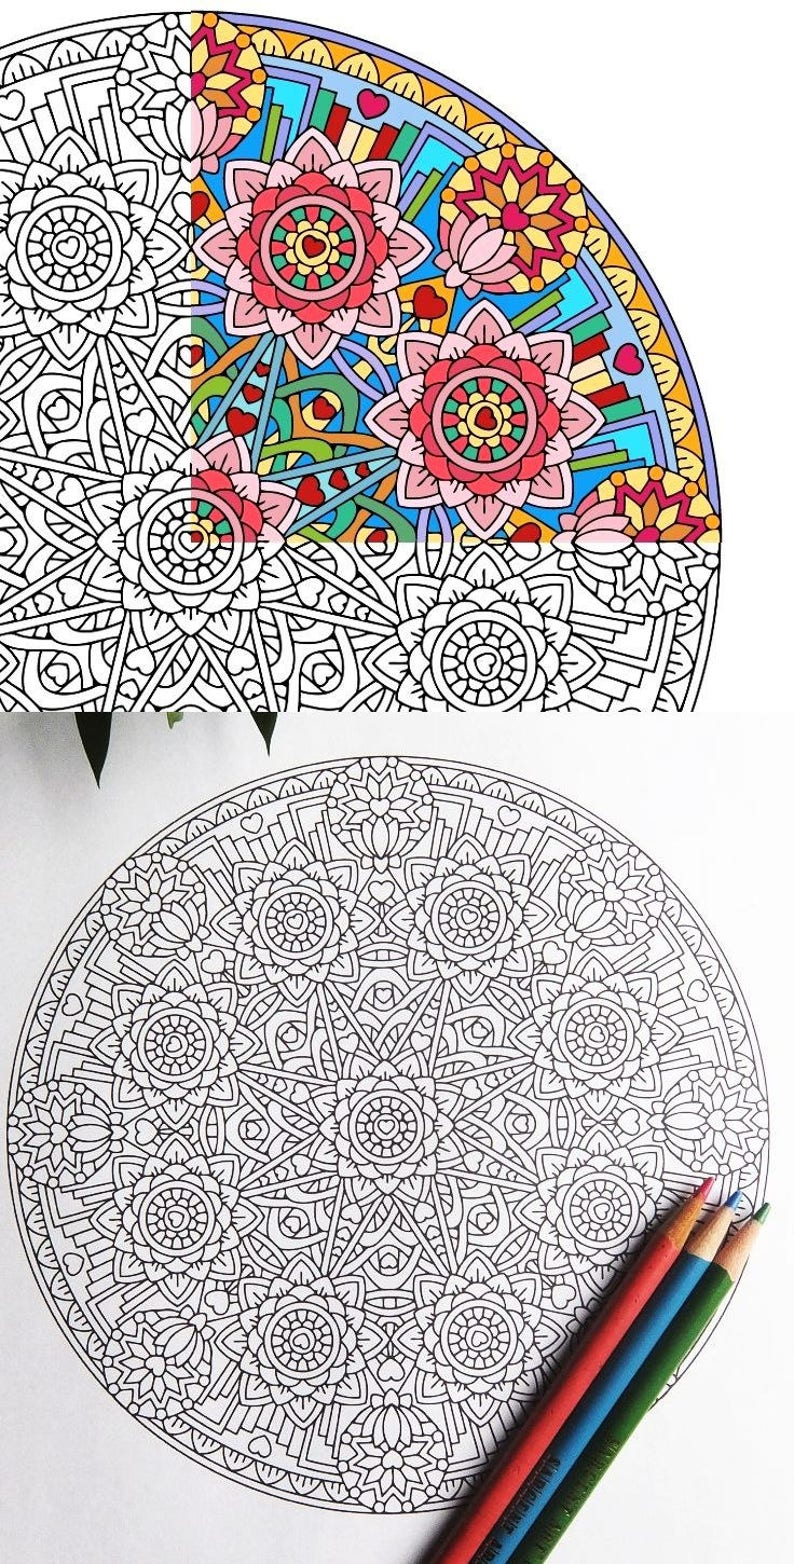 Kleurplaten Ster Mandala.Mandala Kleurplaat Gelijkmoedigheid Upekkha Afdrukbare Etsy